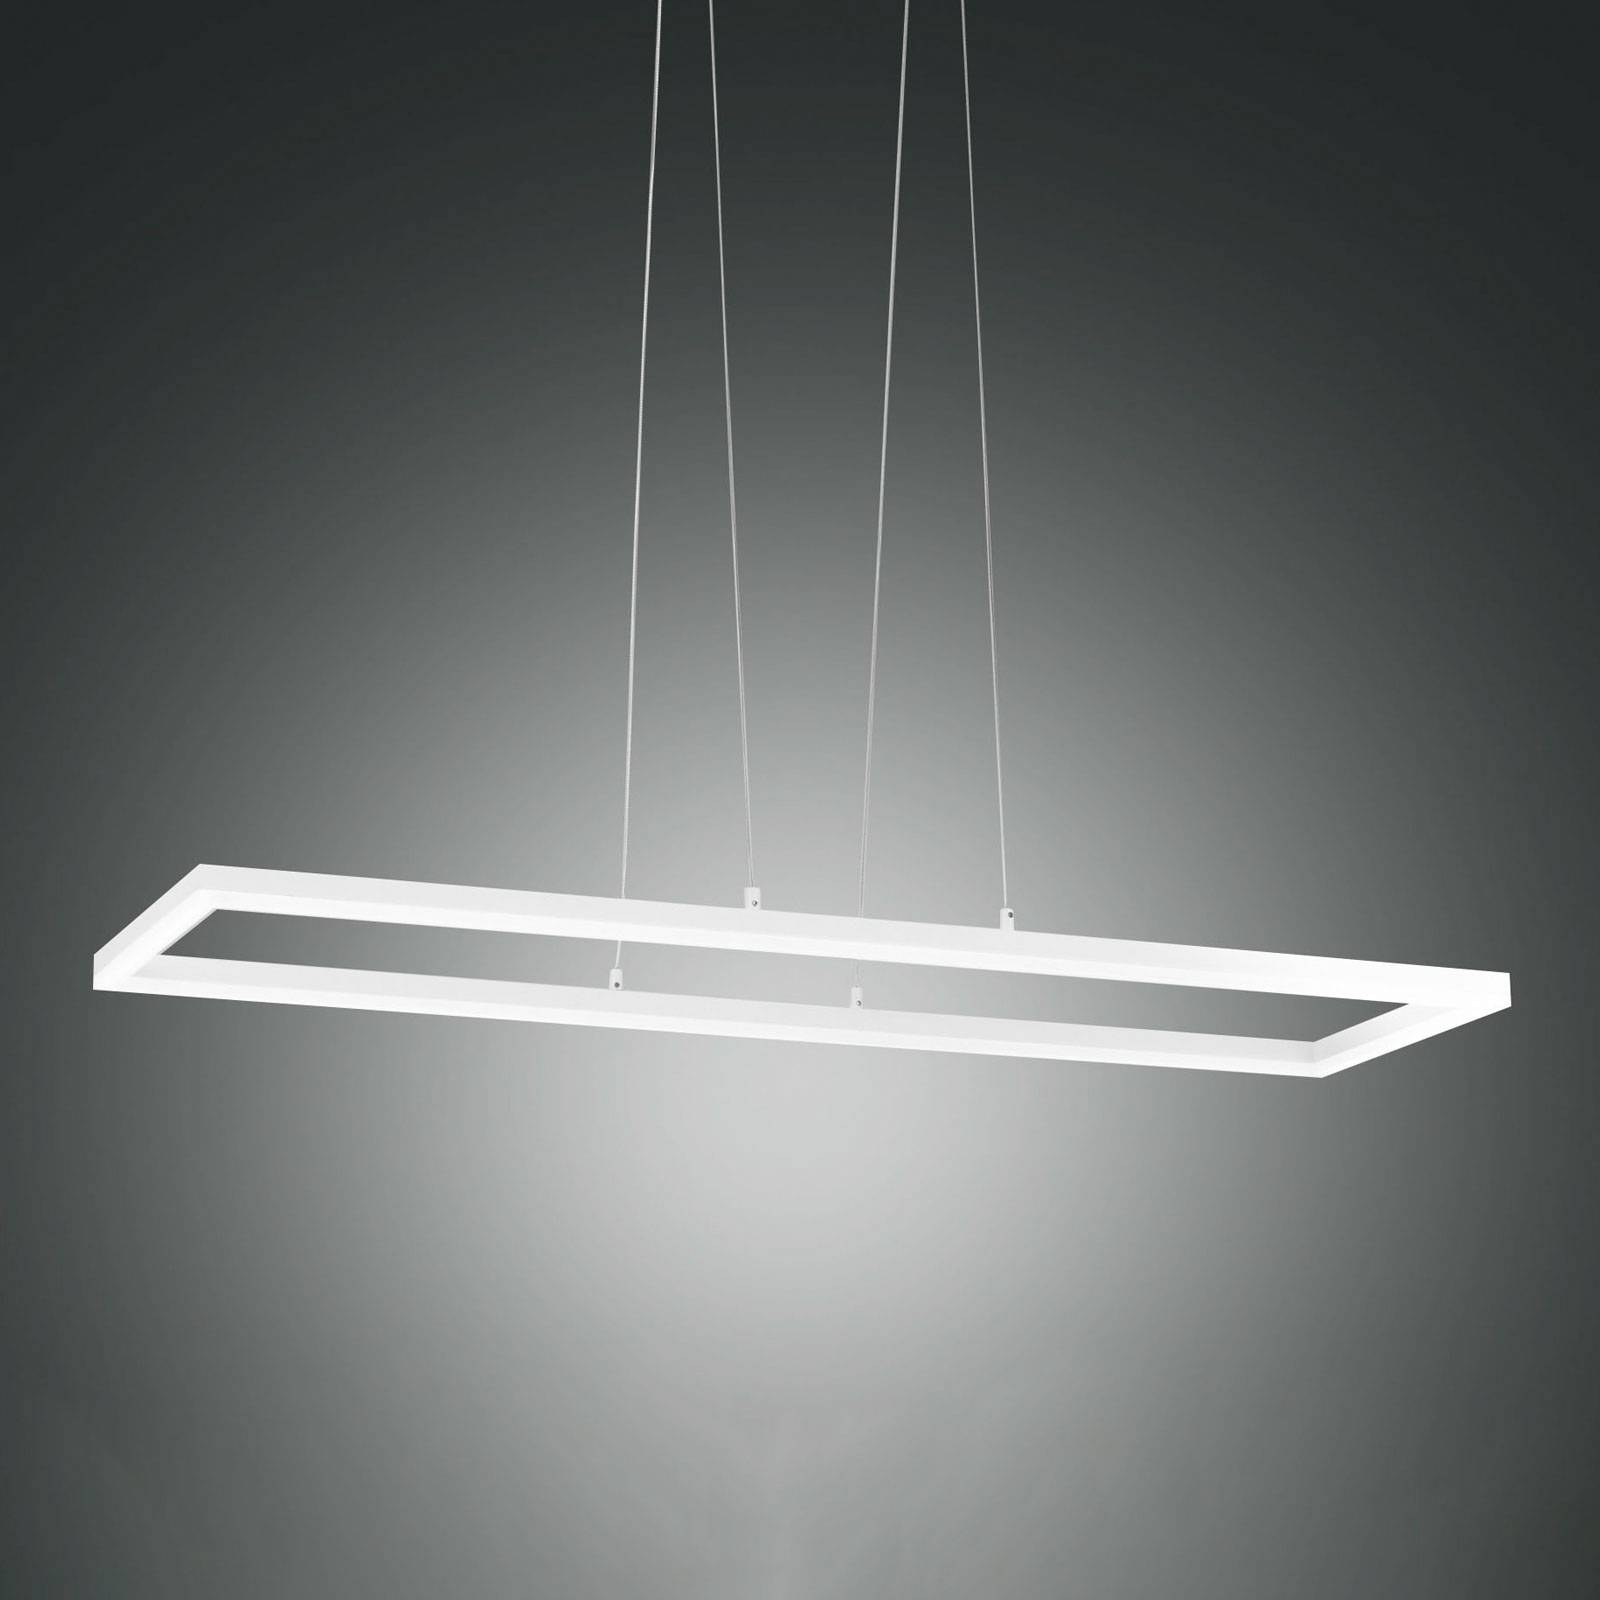 Suspension LED Bard 92x32cm en blanc